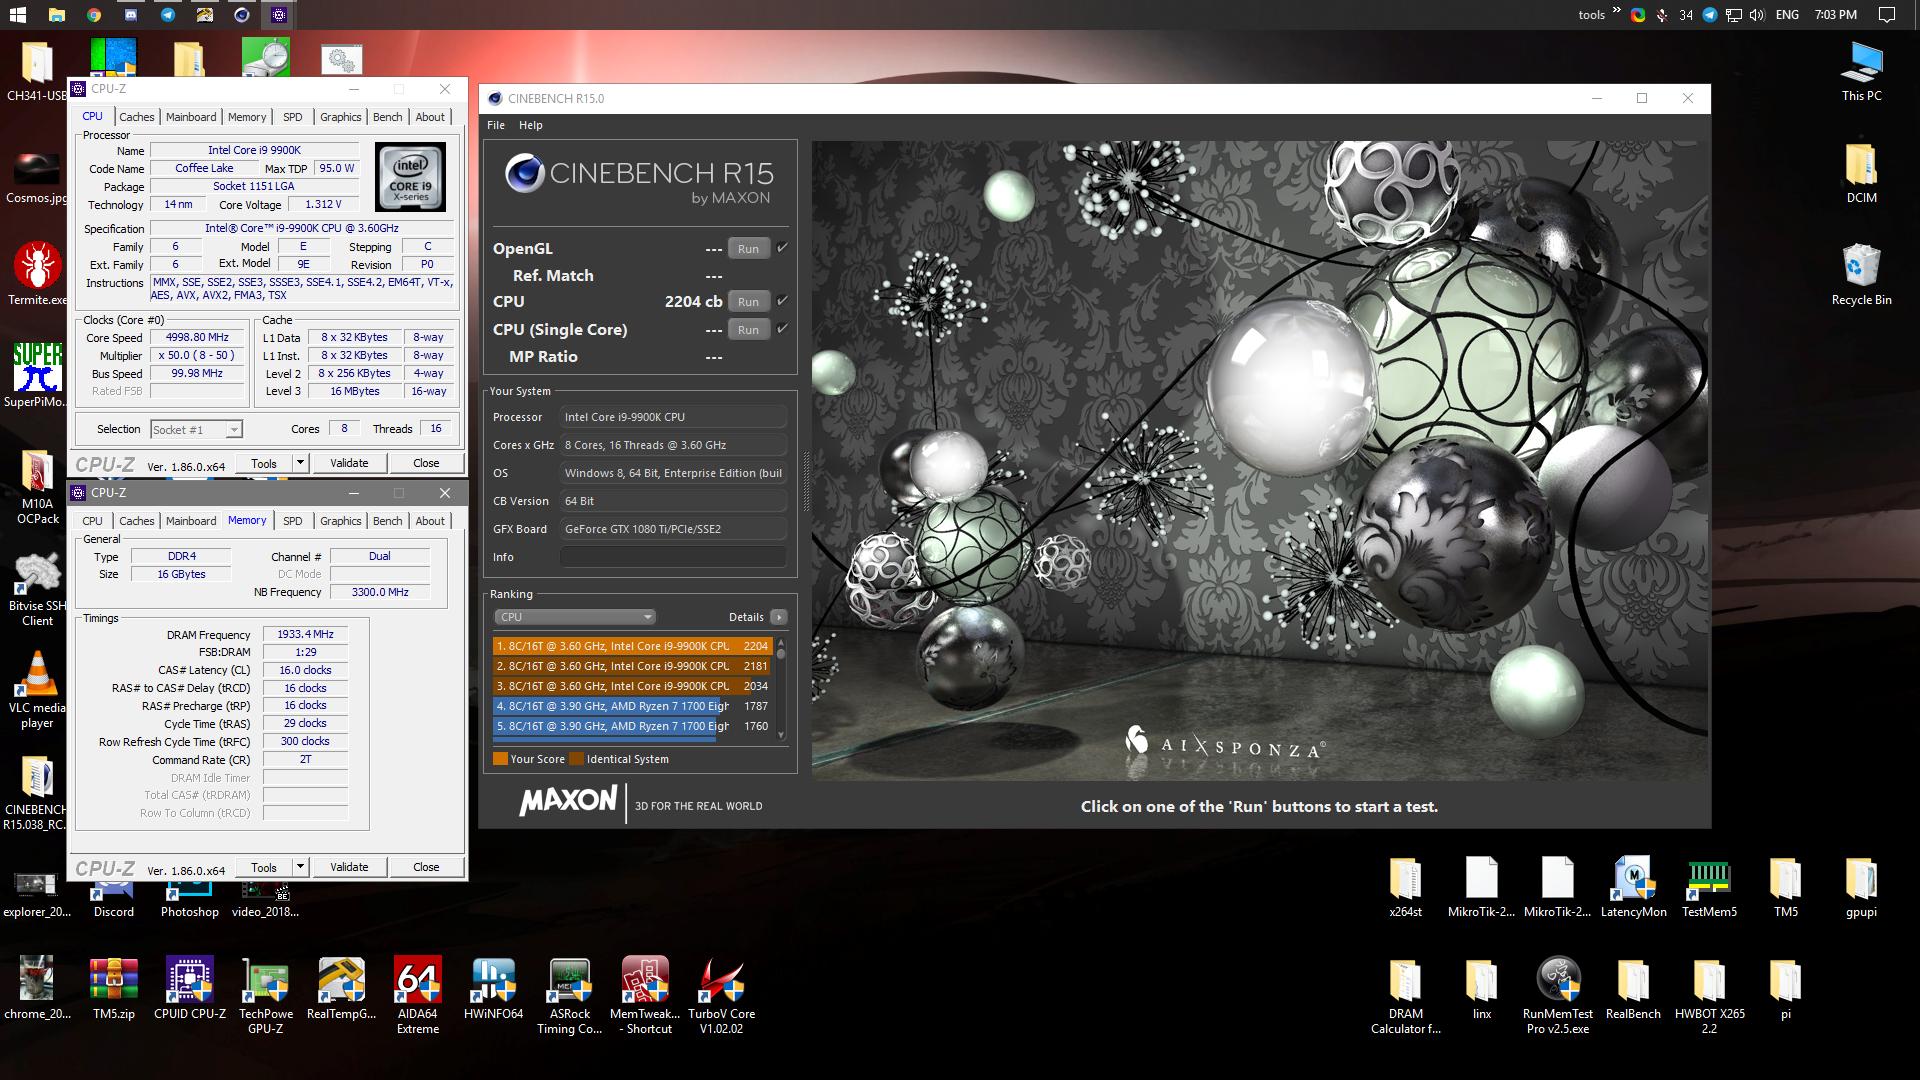 paladzin`s Cinebench - R15 score: 2204 cb with a Core i9 9900K